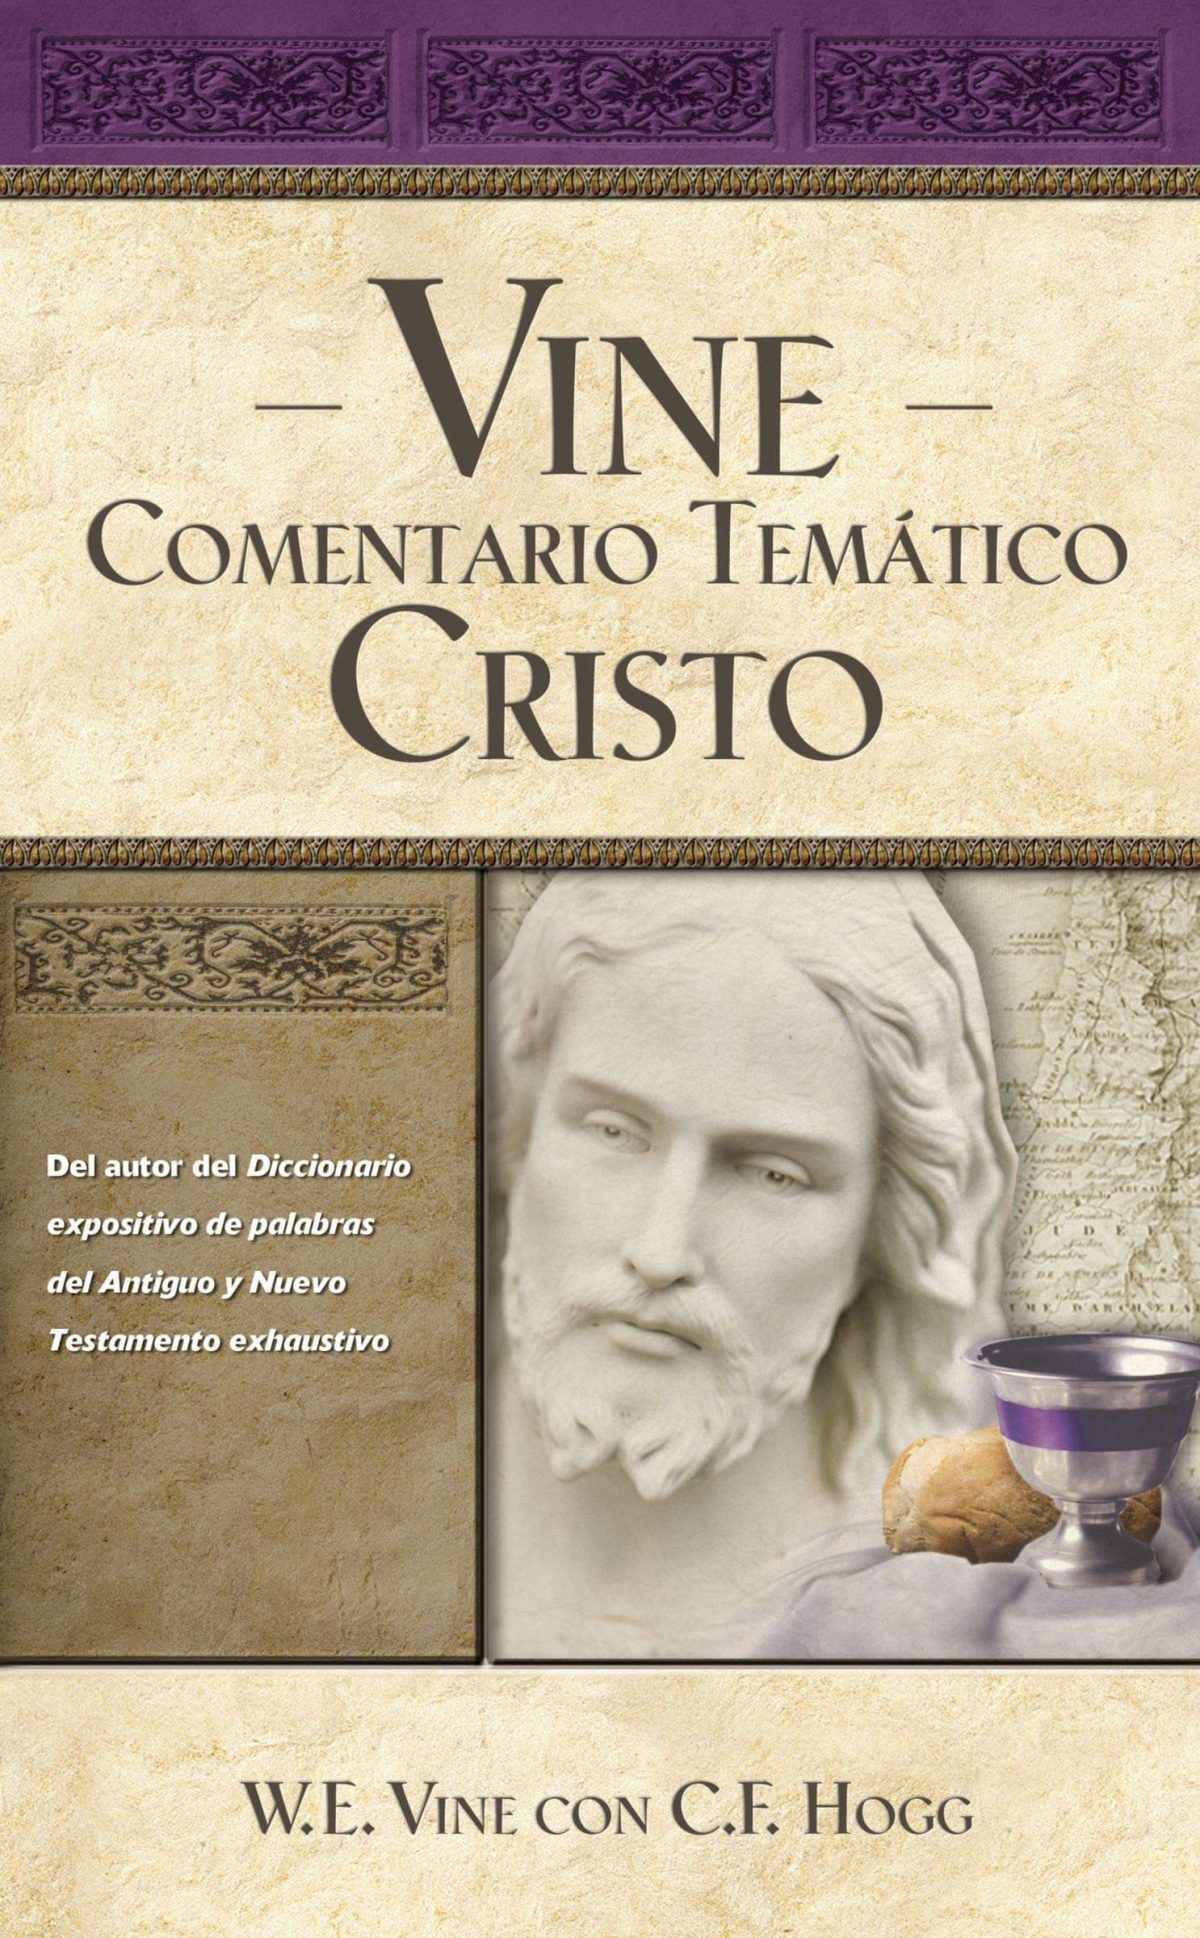 VINE - COMENTARIO TEMÁTICO CRISTO